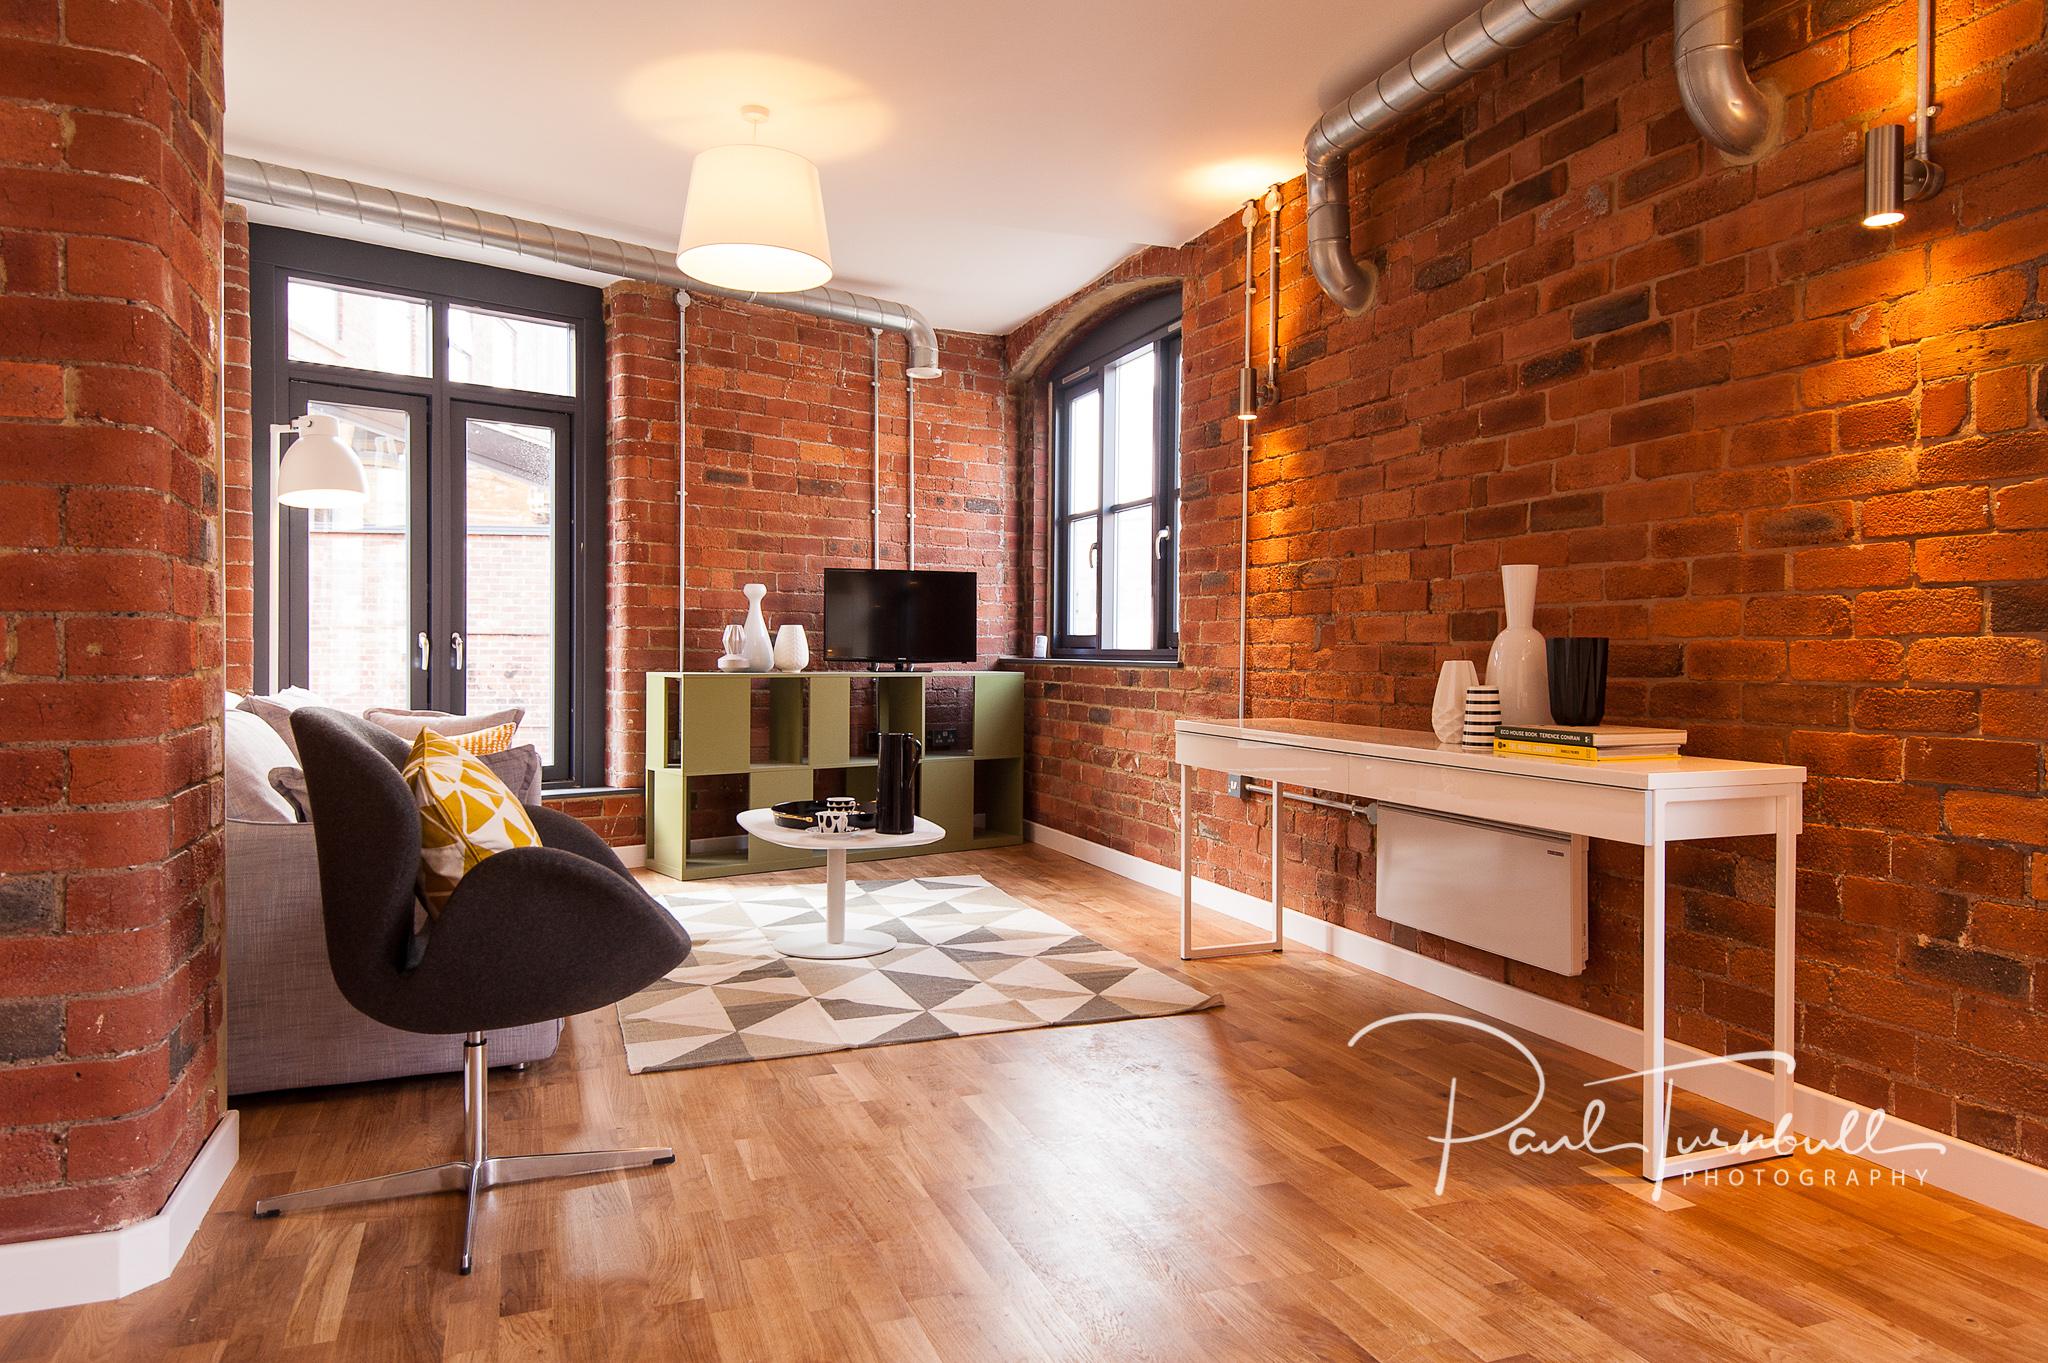 commercial-property-photographer-leeds-yorkshire-blackbrook-developments-047.jpg